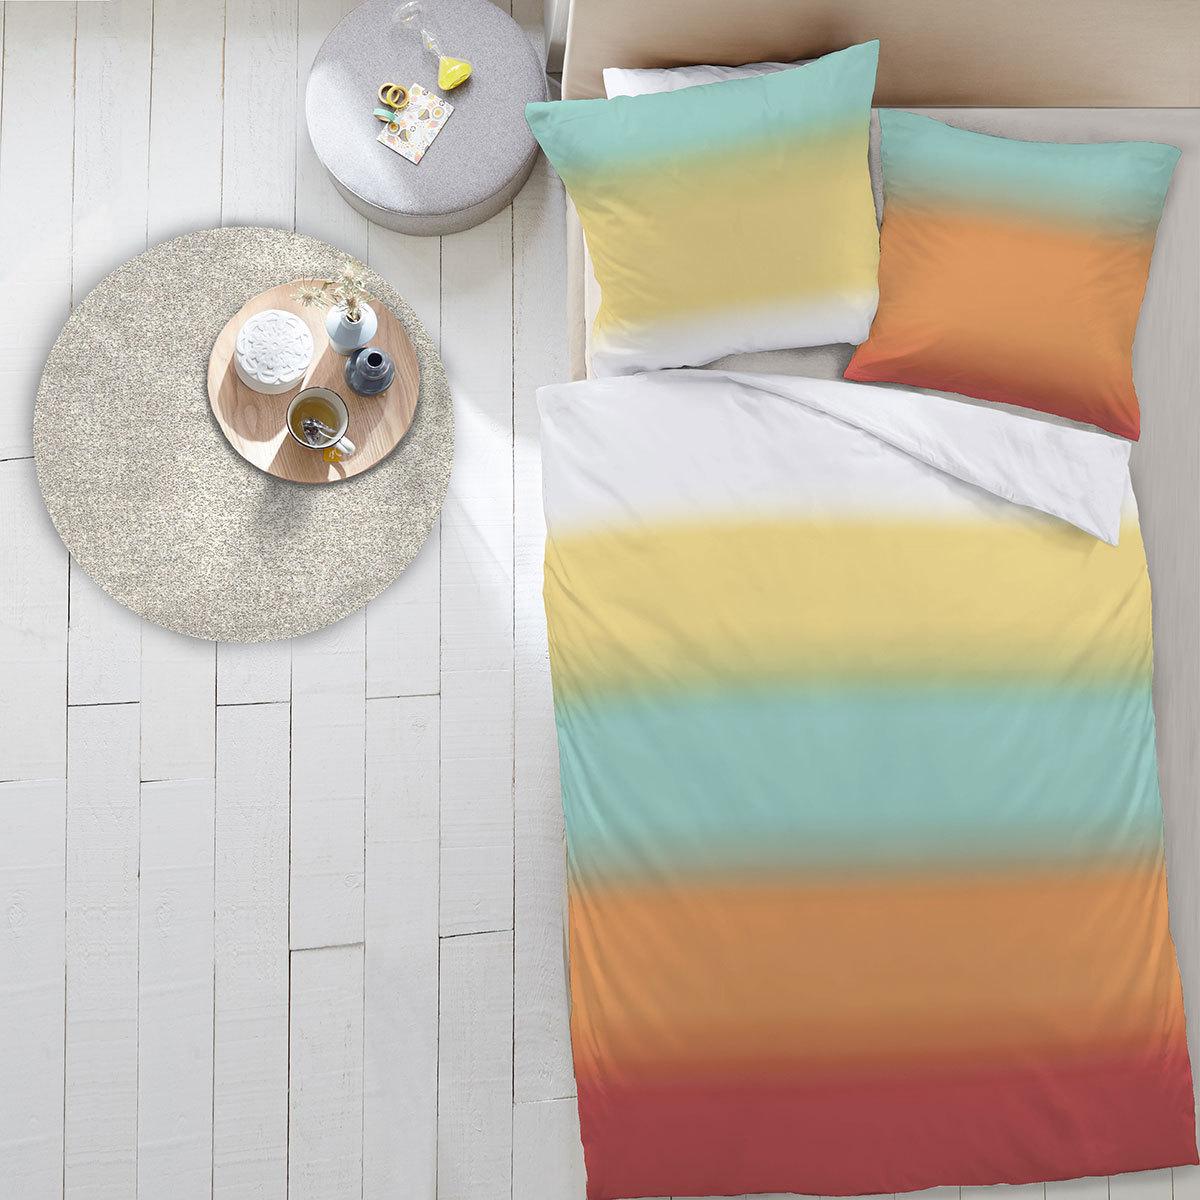 dormisette biber bettw sche 3138 010 g nstig online kaufen bei bettwaren shop. Black Bedroom Furniture Sets. Home Design Ideas